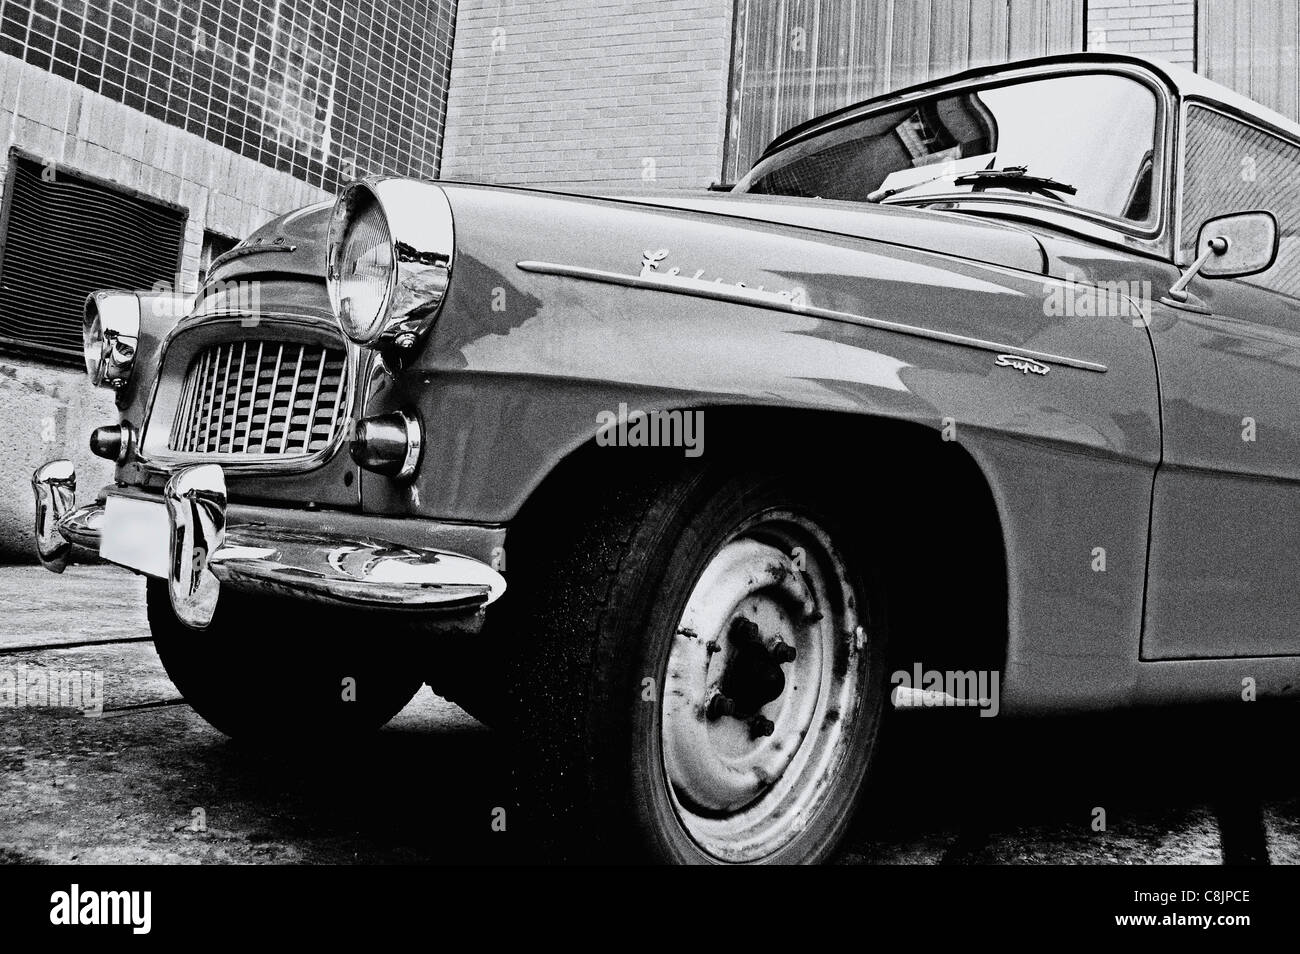 vintage skoda felicia car - Stock Image